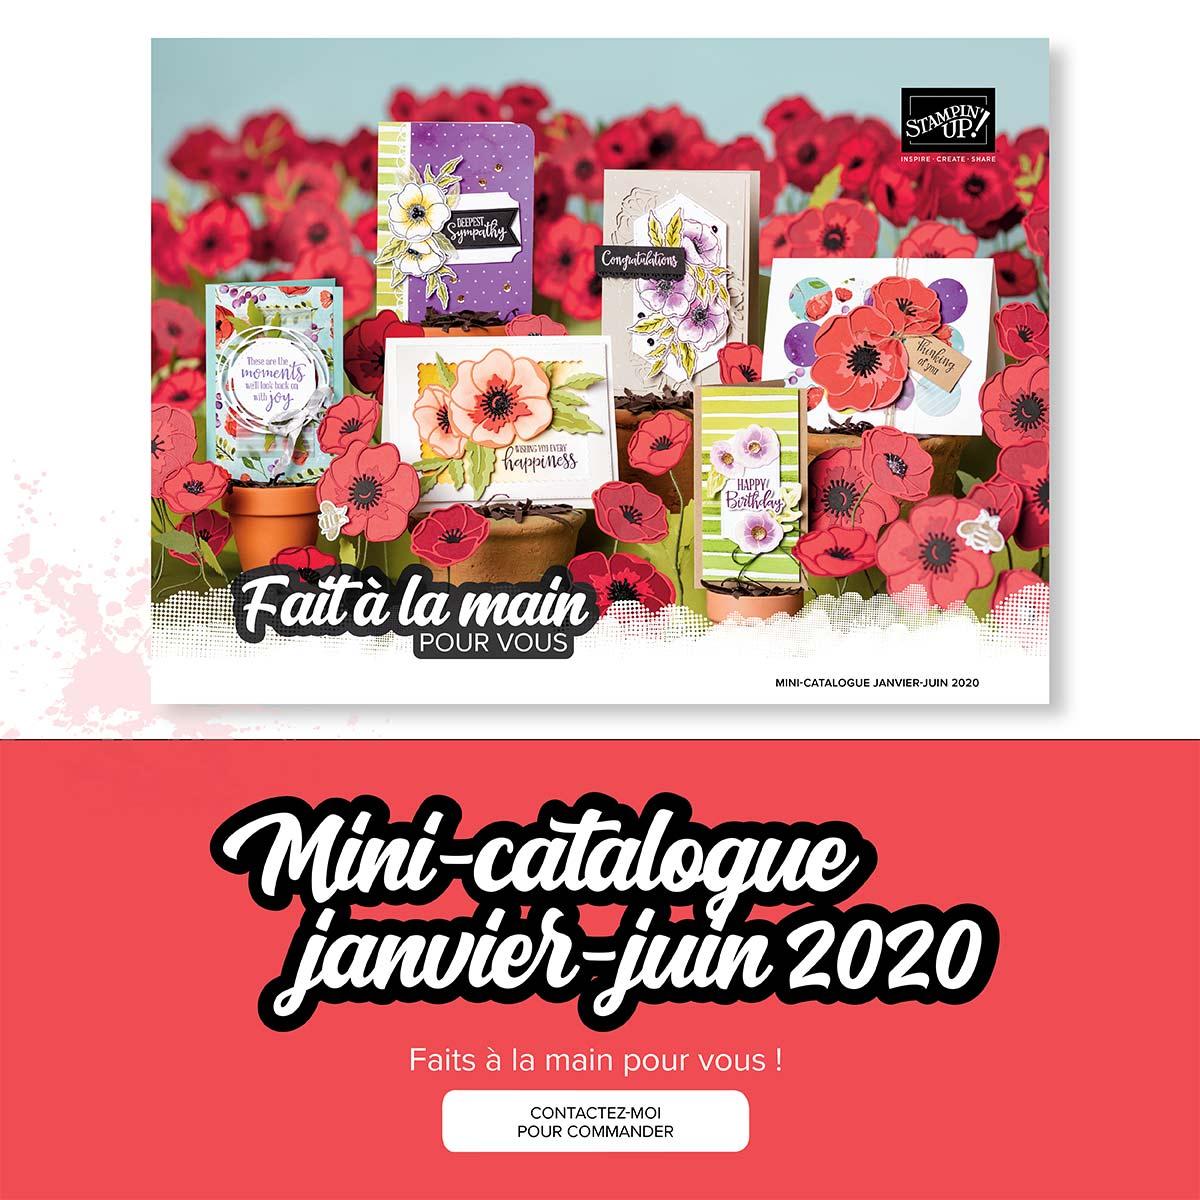 Mini-catalogue Janvier-Juin 2020